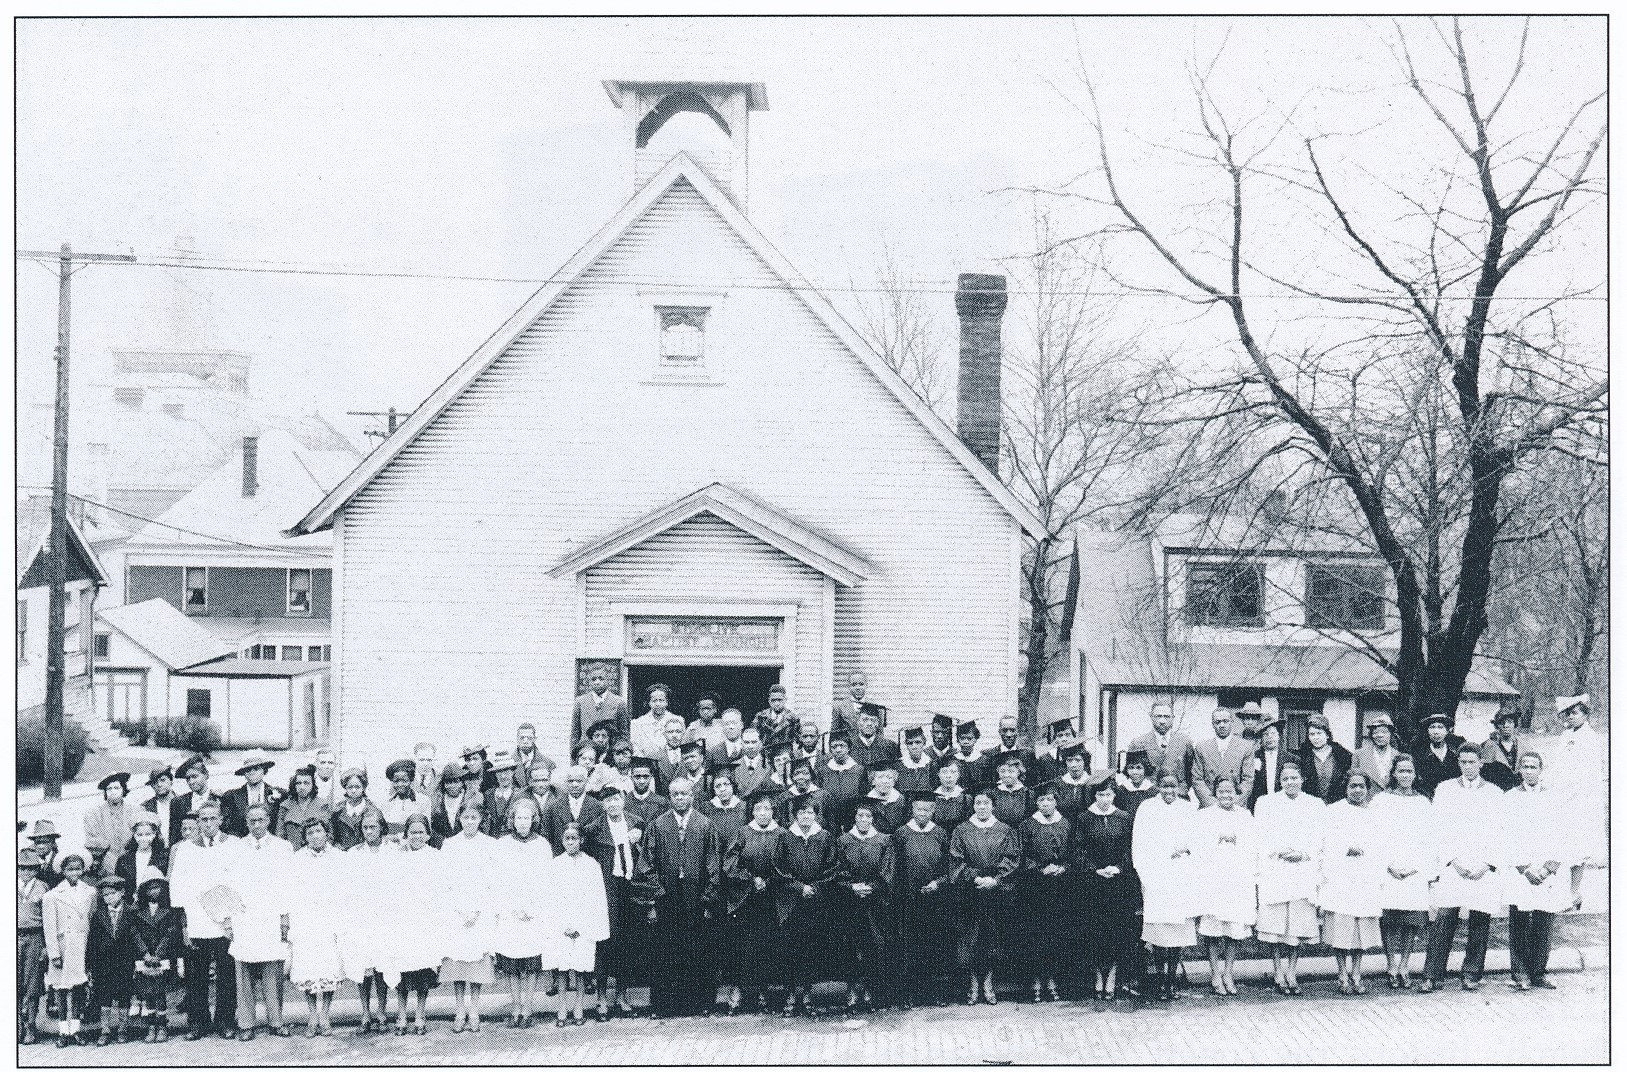 Mount Olive Baptist Church - School & Highland.jpg